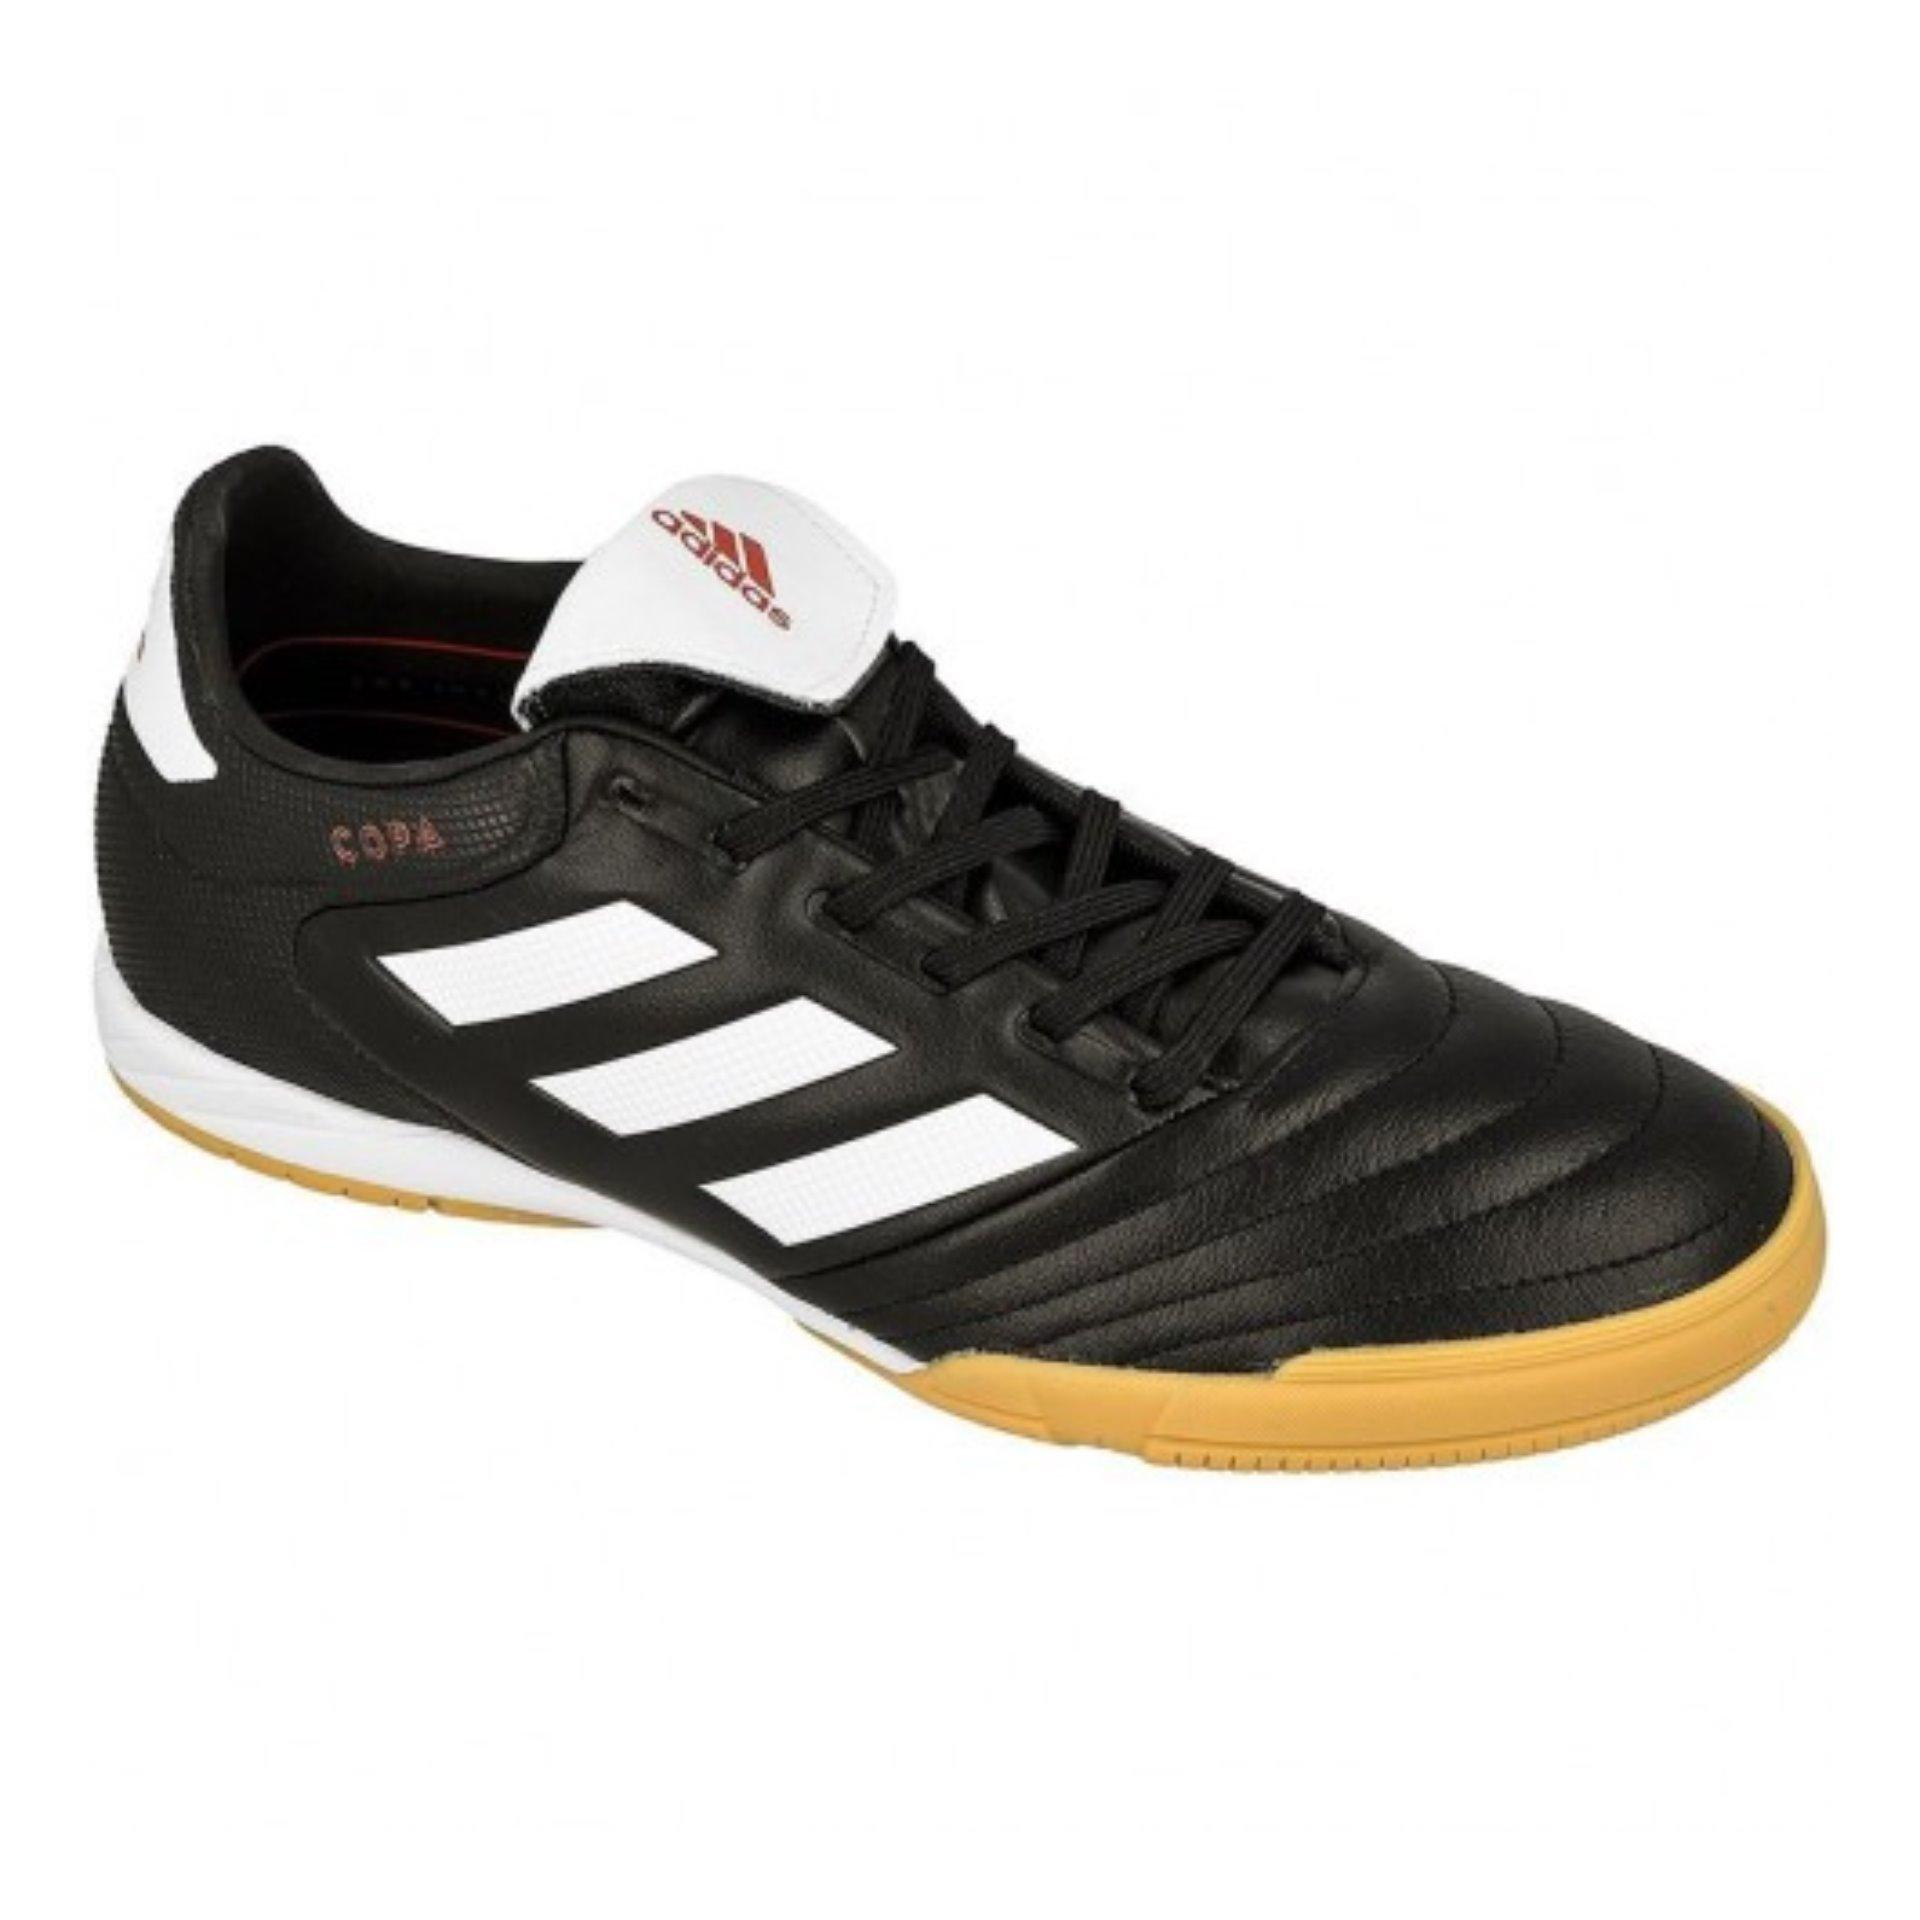 Toko Adidas Sepatu Futsal Copa 17 3 In Bb0851 Hitam Dekat Sini